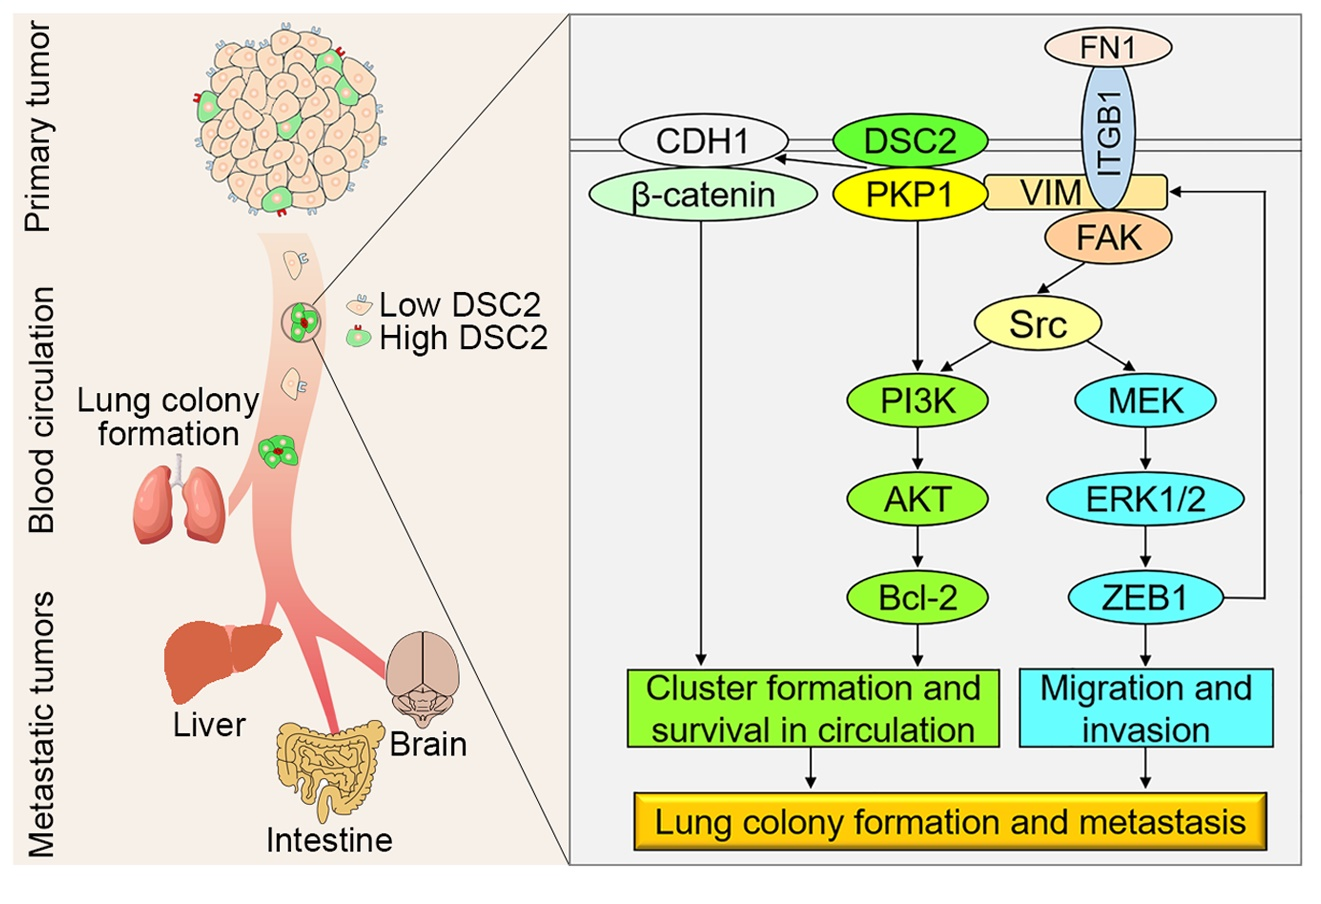 UM FHS study may help develop new anti-metastasis therapies